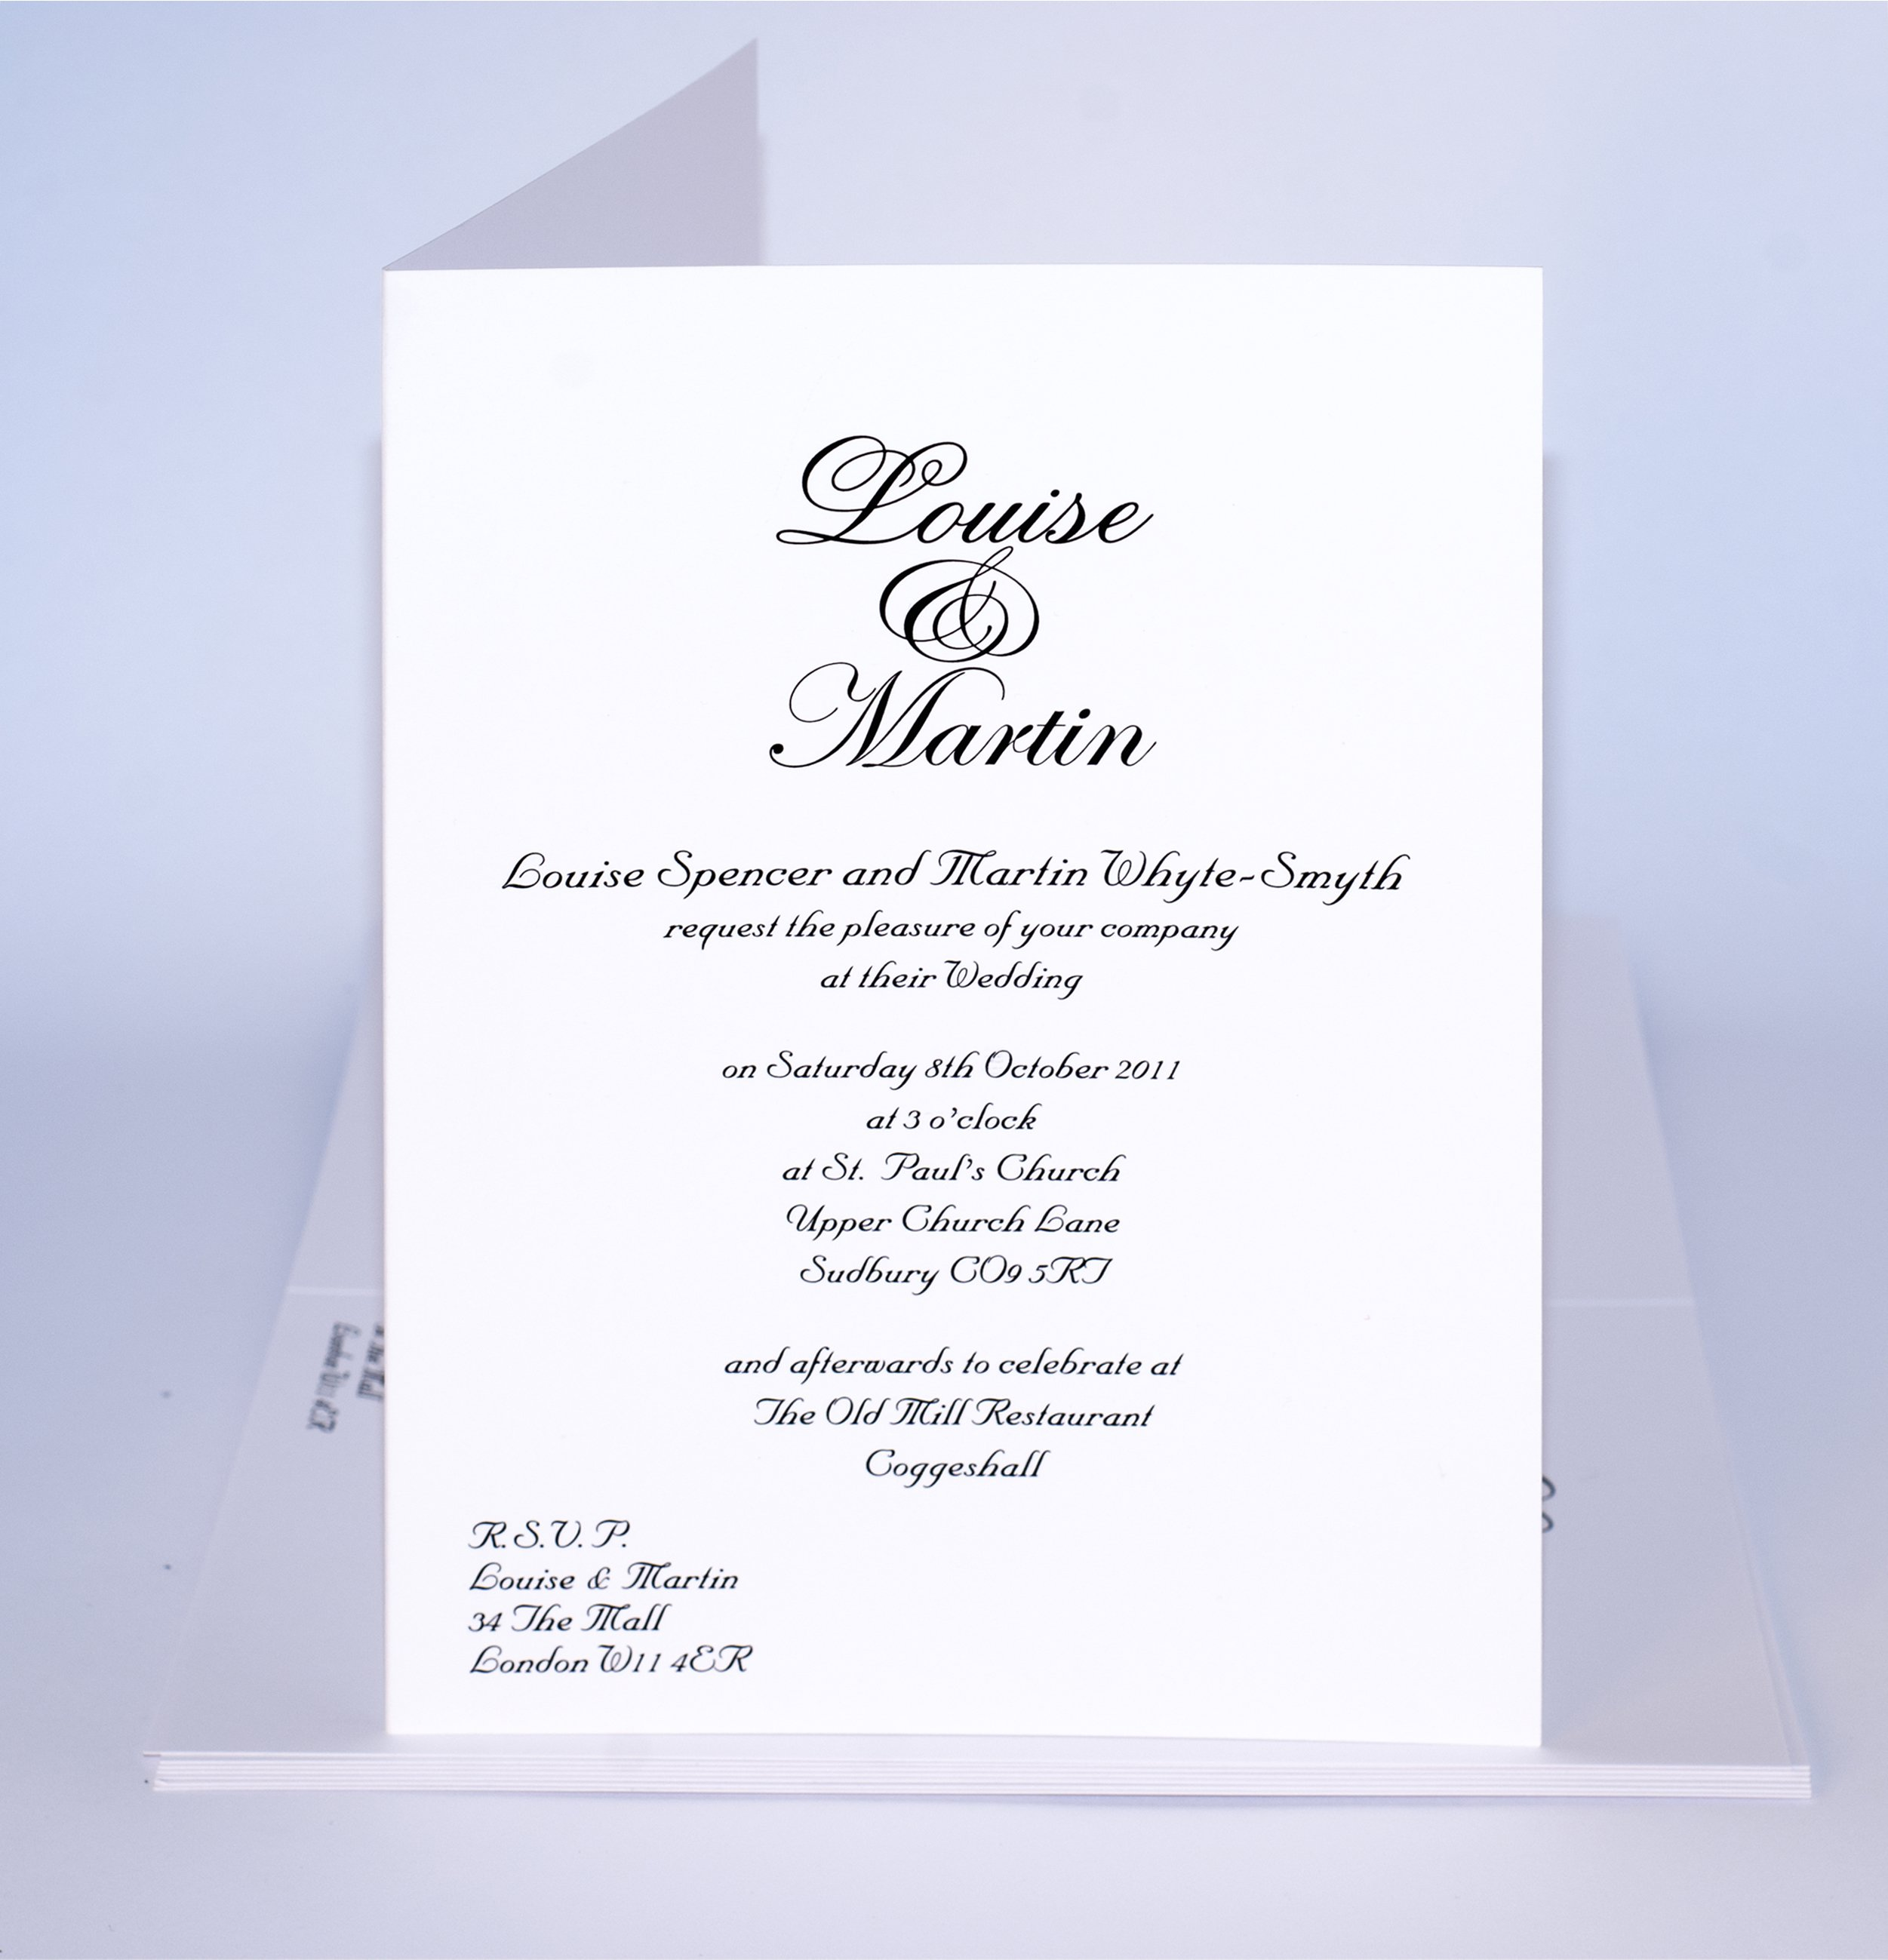 Sample Wedding Invitation Cards Templates